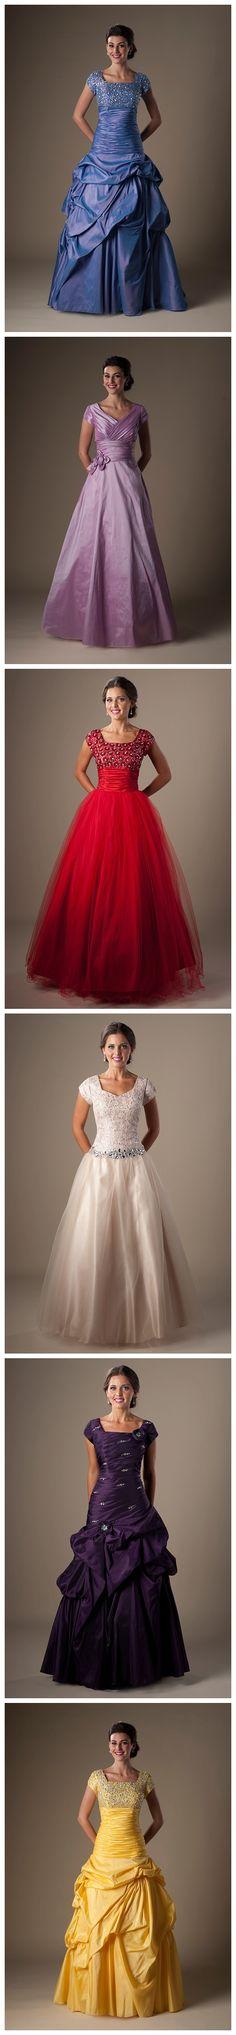 Modest prom dresses. Prom dress ideas. Prom fashion. Prom 2015.